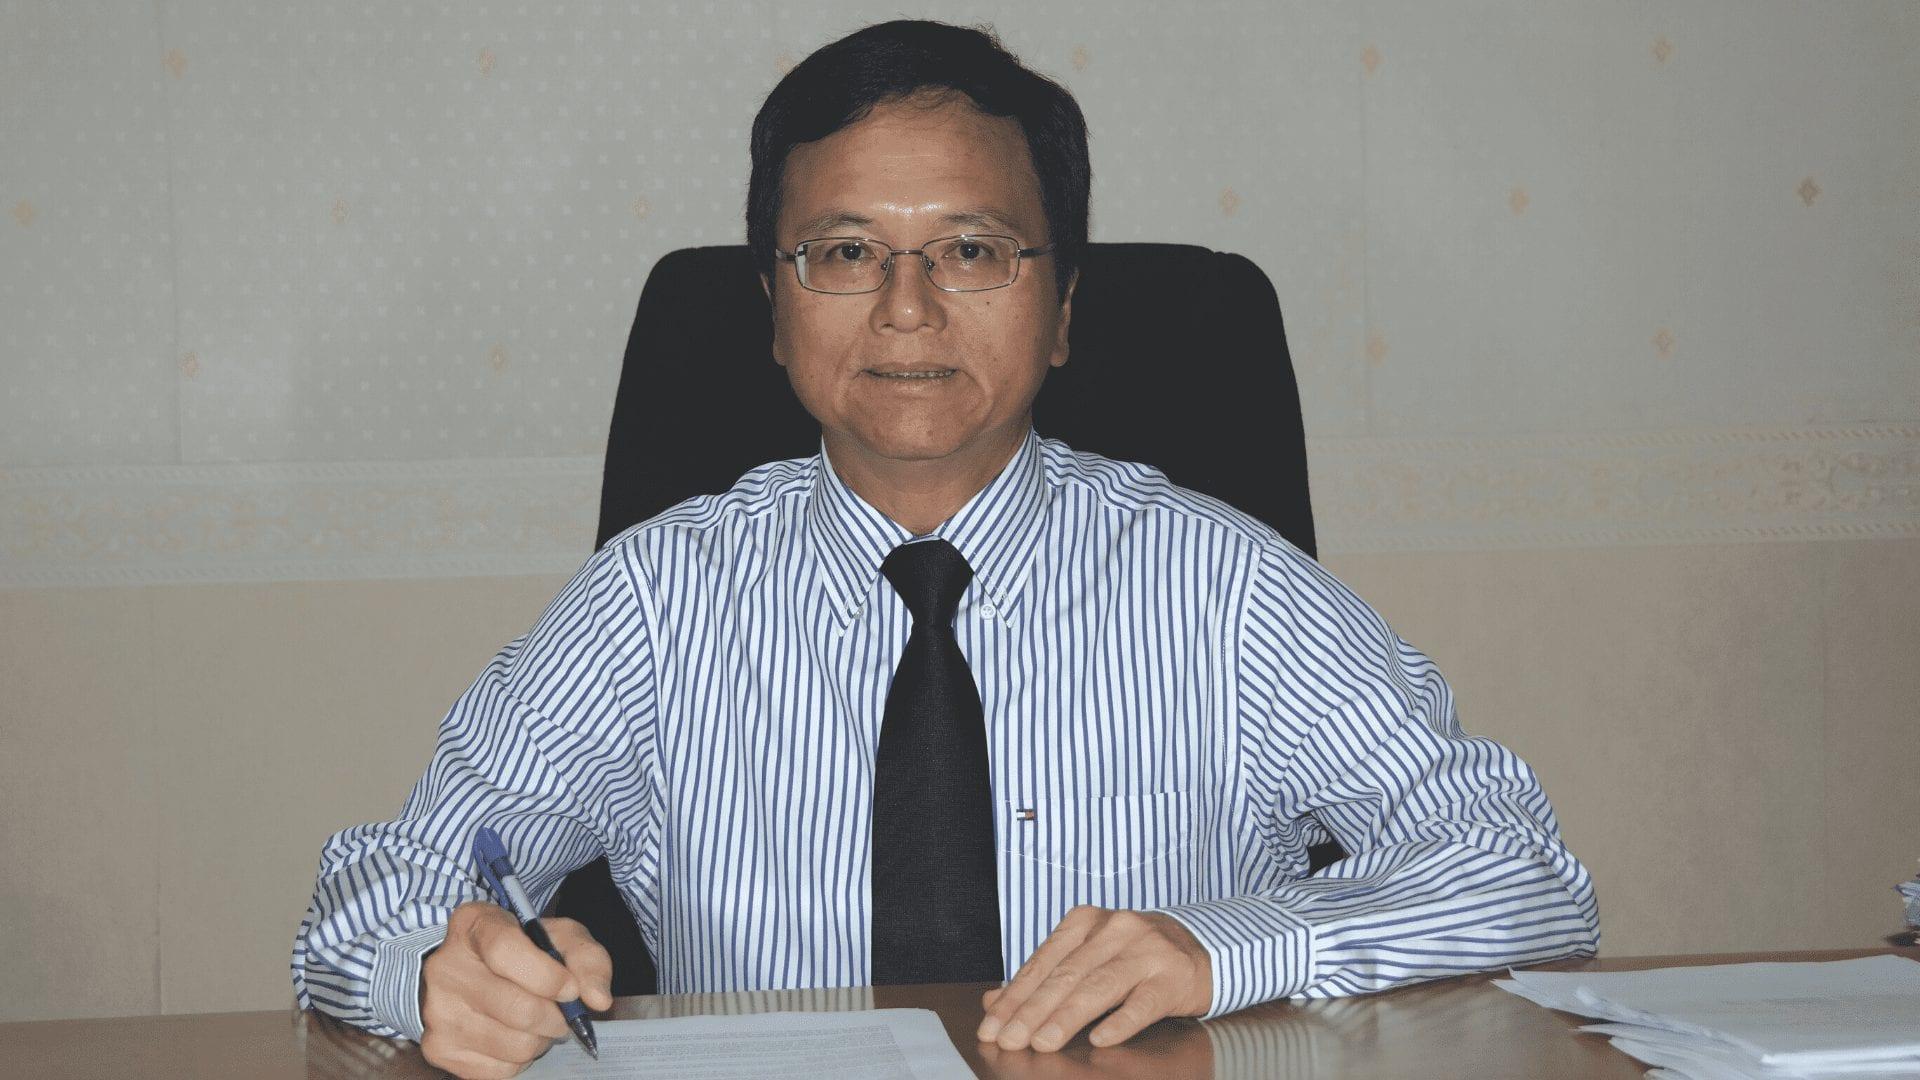 Francis Lau Choo Yew